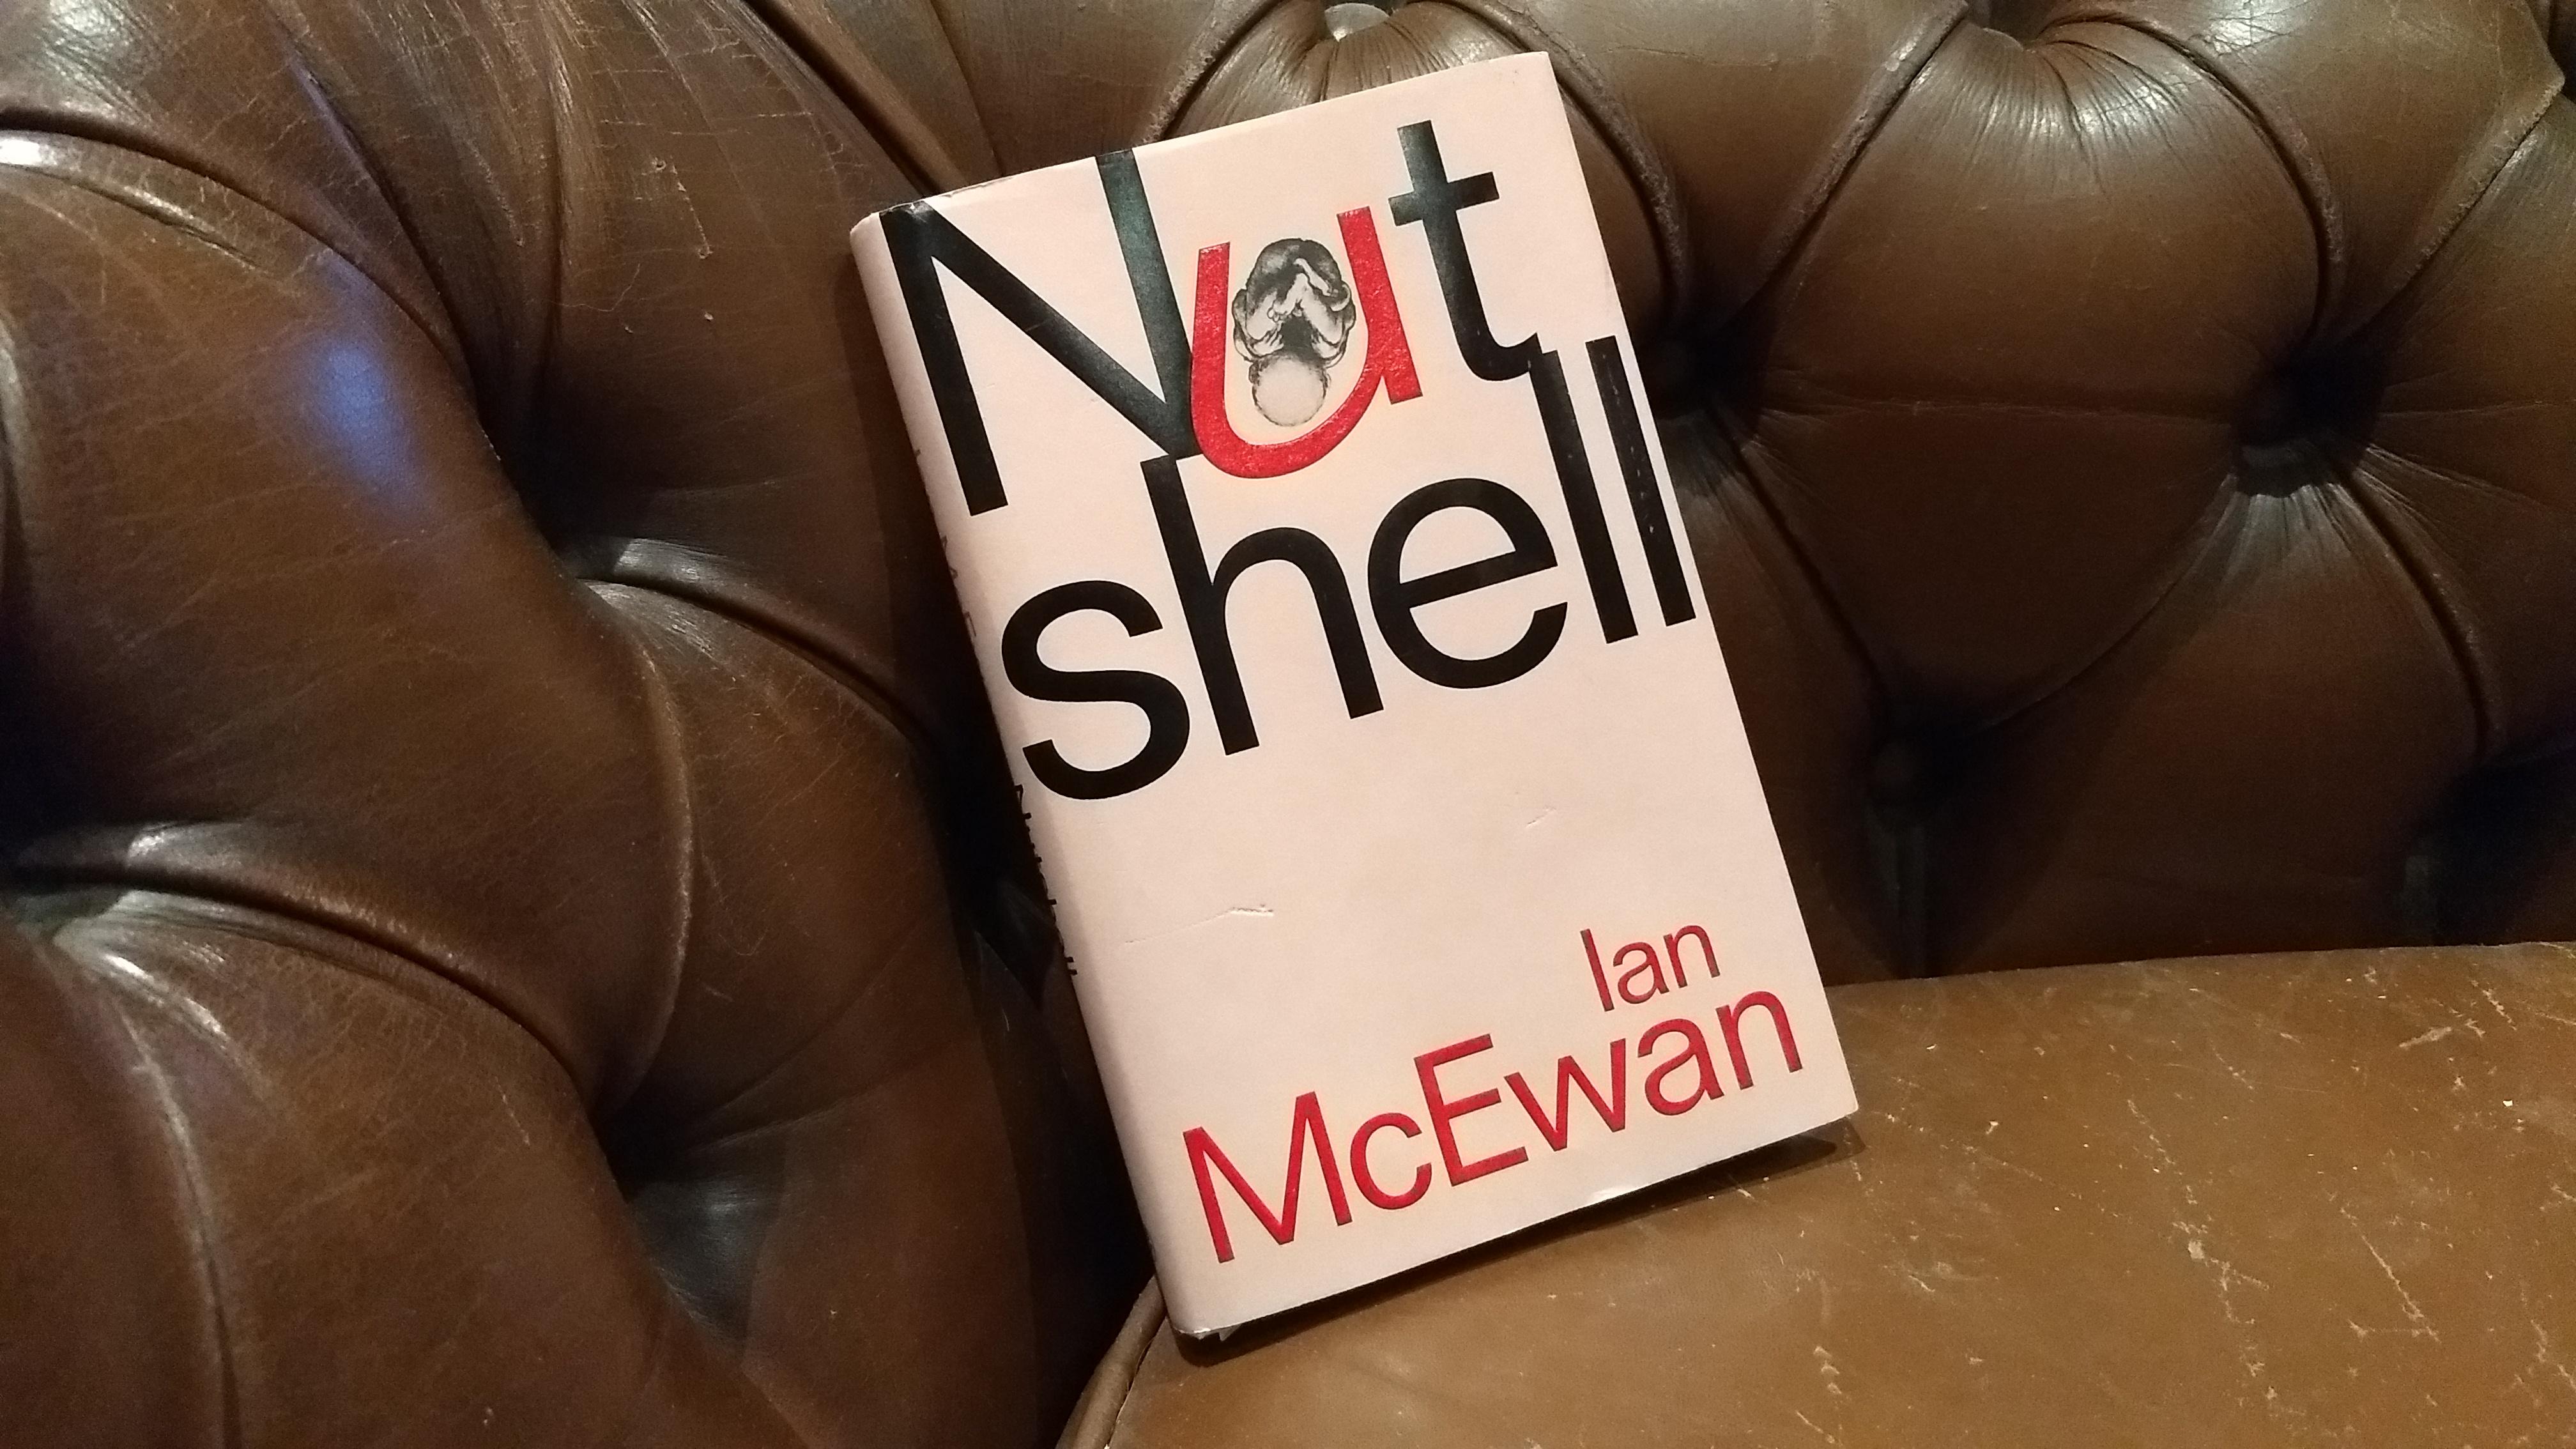 Nutshell van Ian McEwan